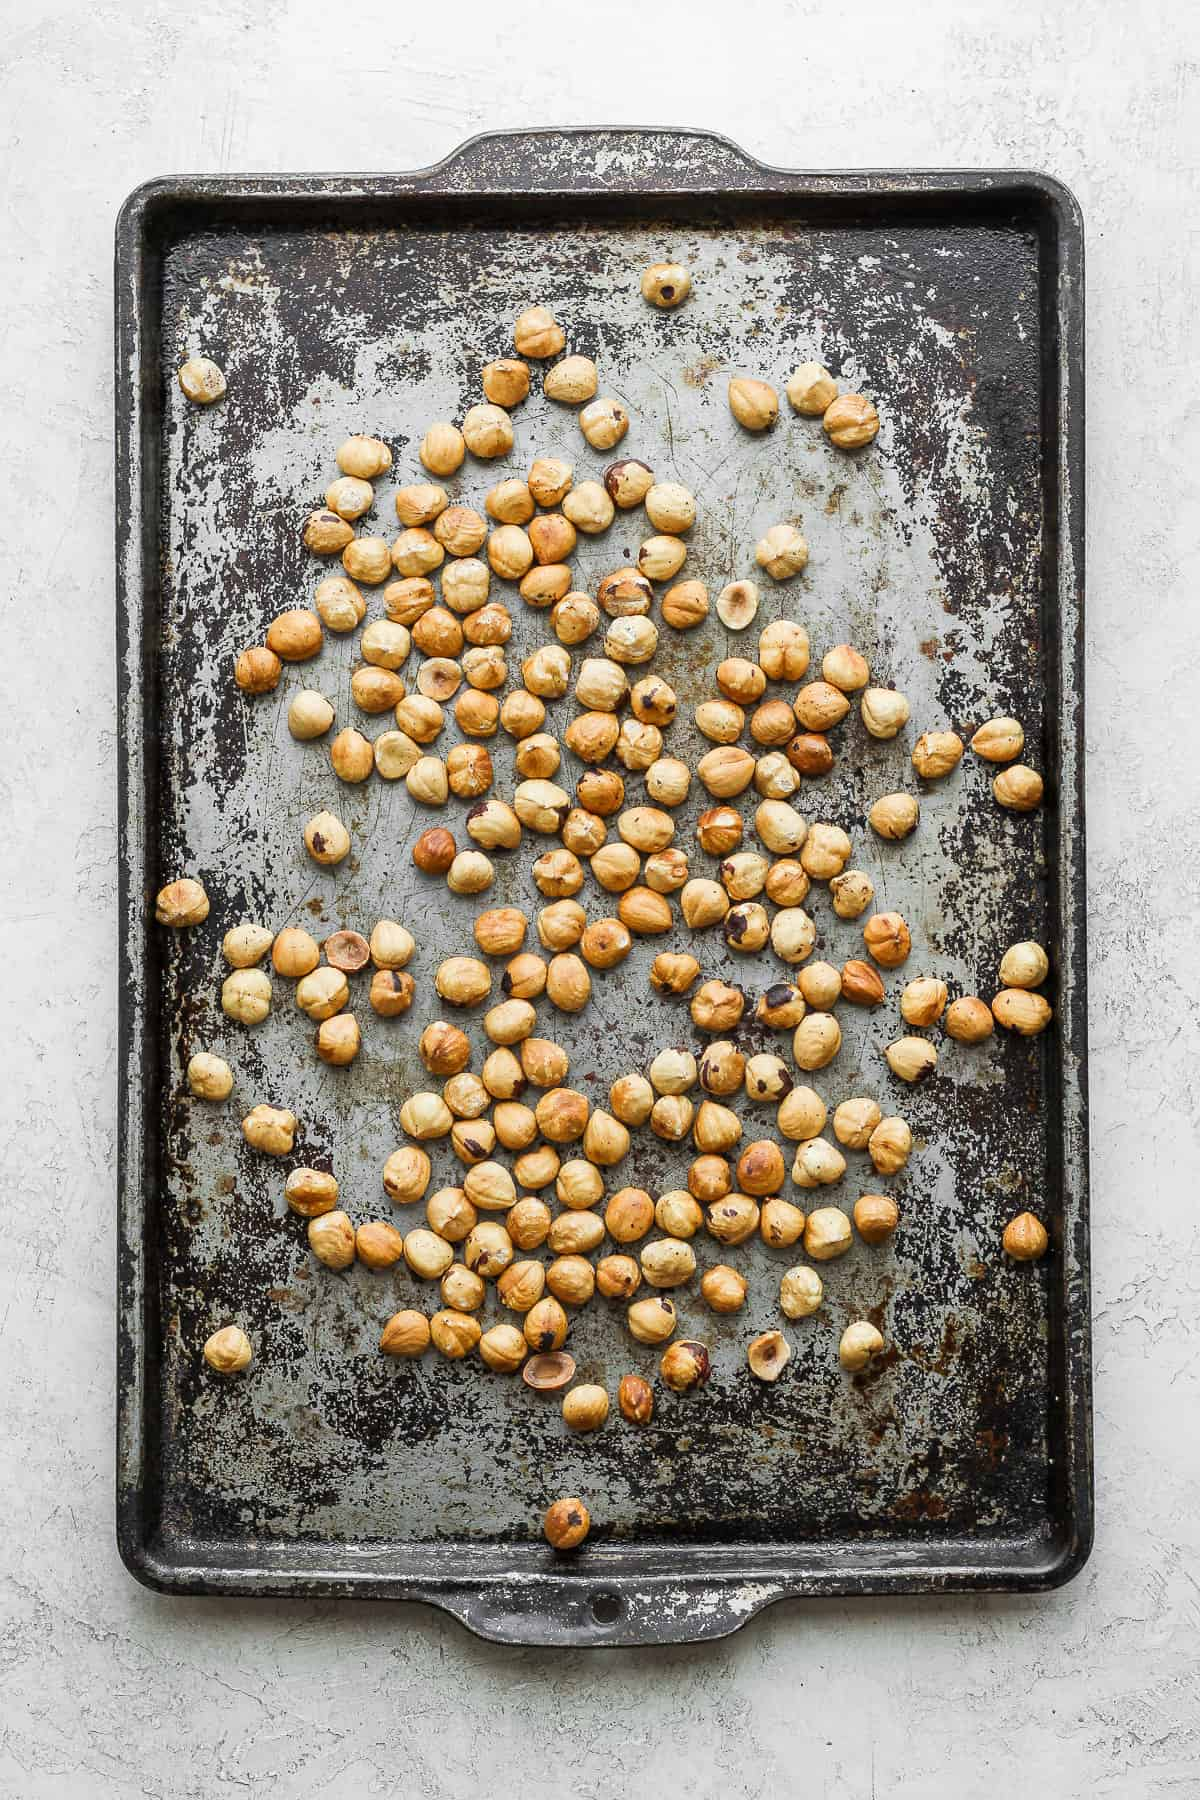 Sheet pan to roast the hazelnuts before blending